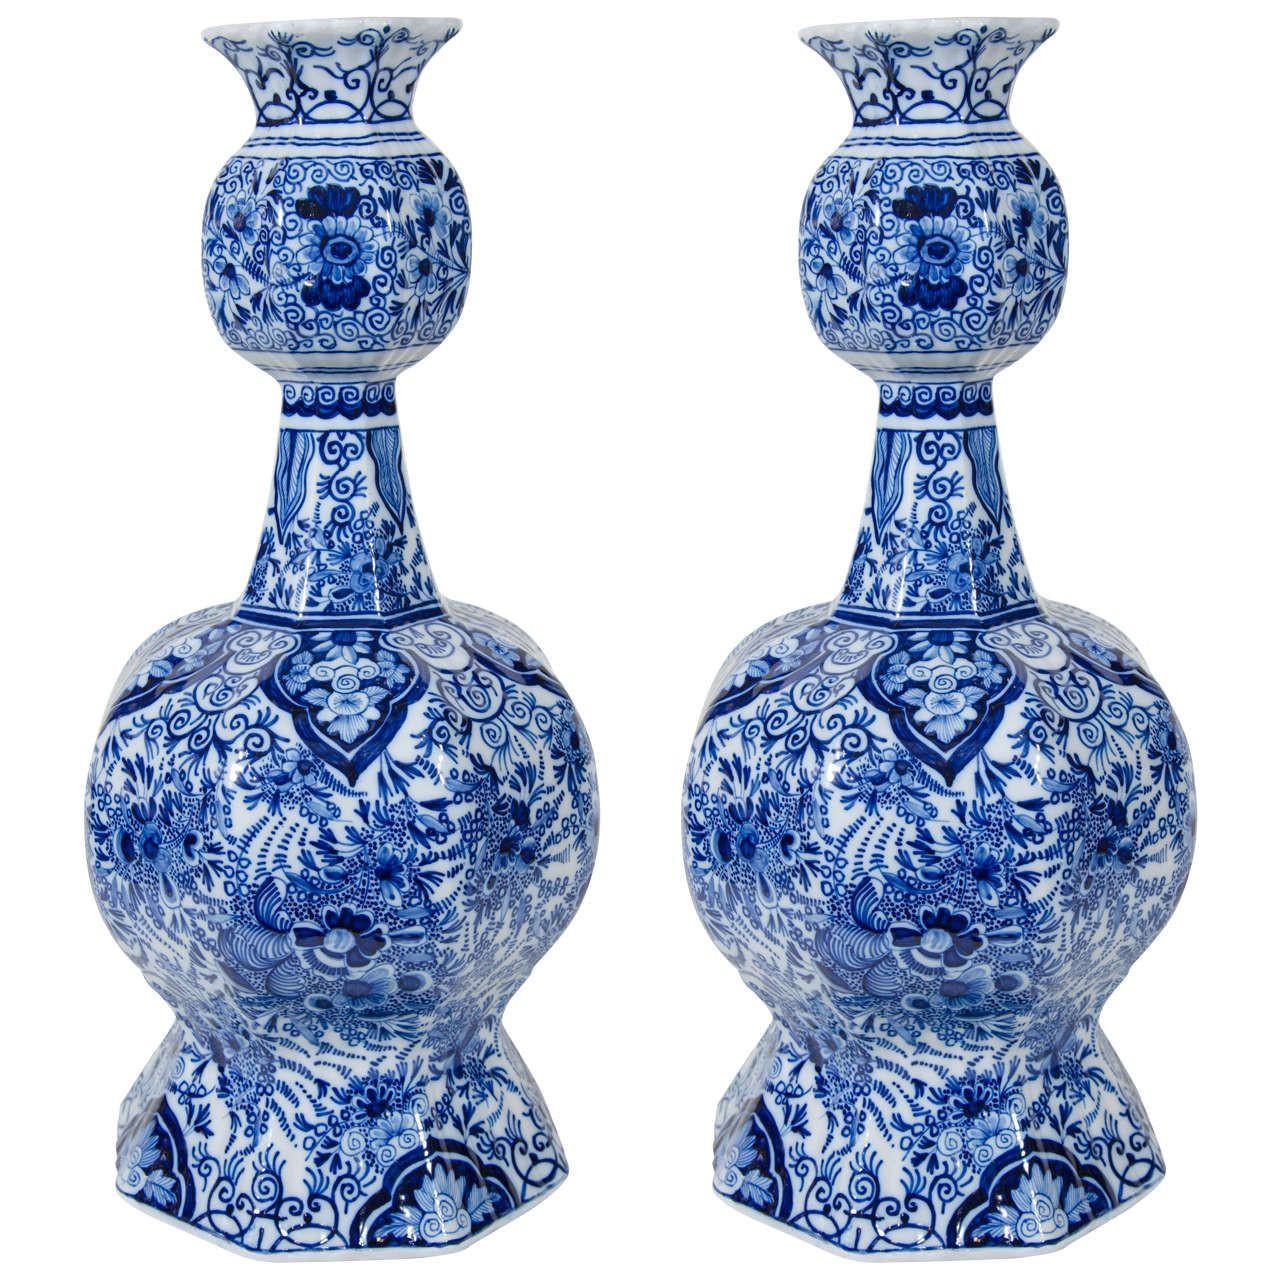 modern white ceramic vase of pair of dutch delft blue and white vases white vases delft and dutch with pair of dutch delft blue and white vases